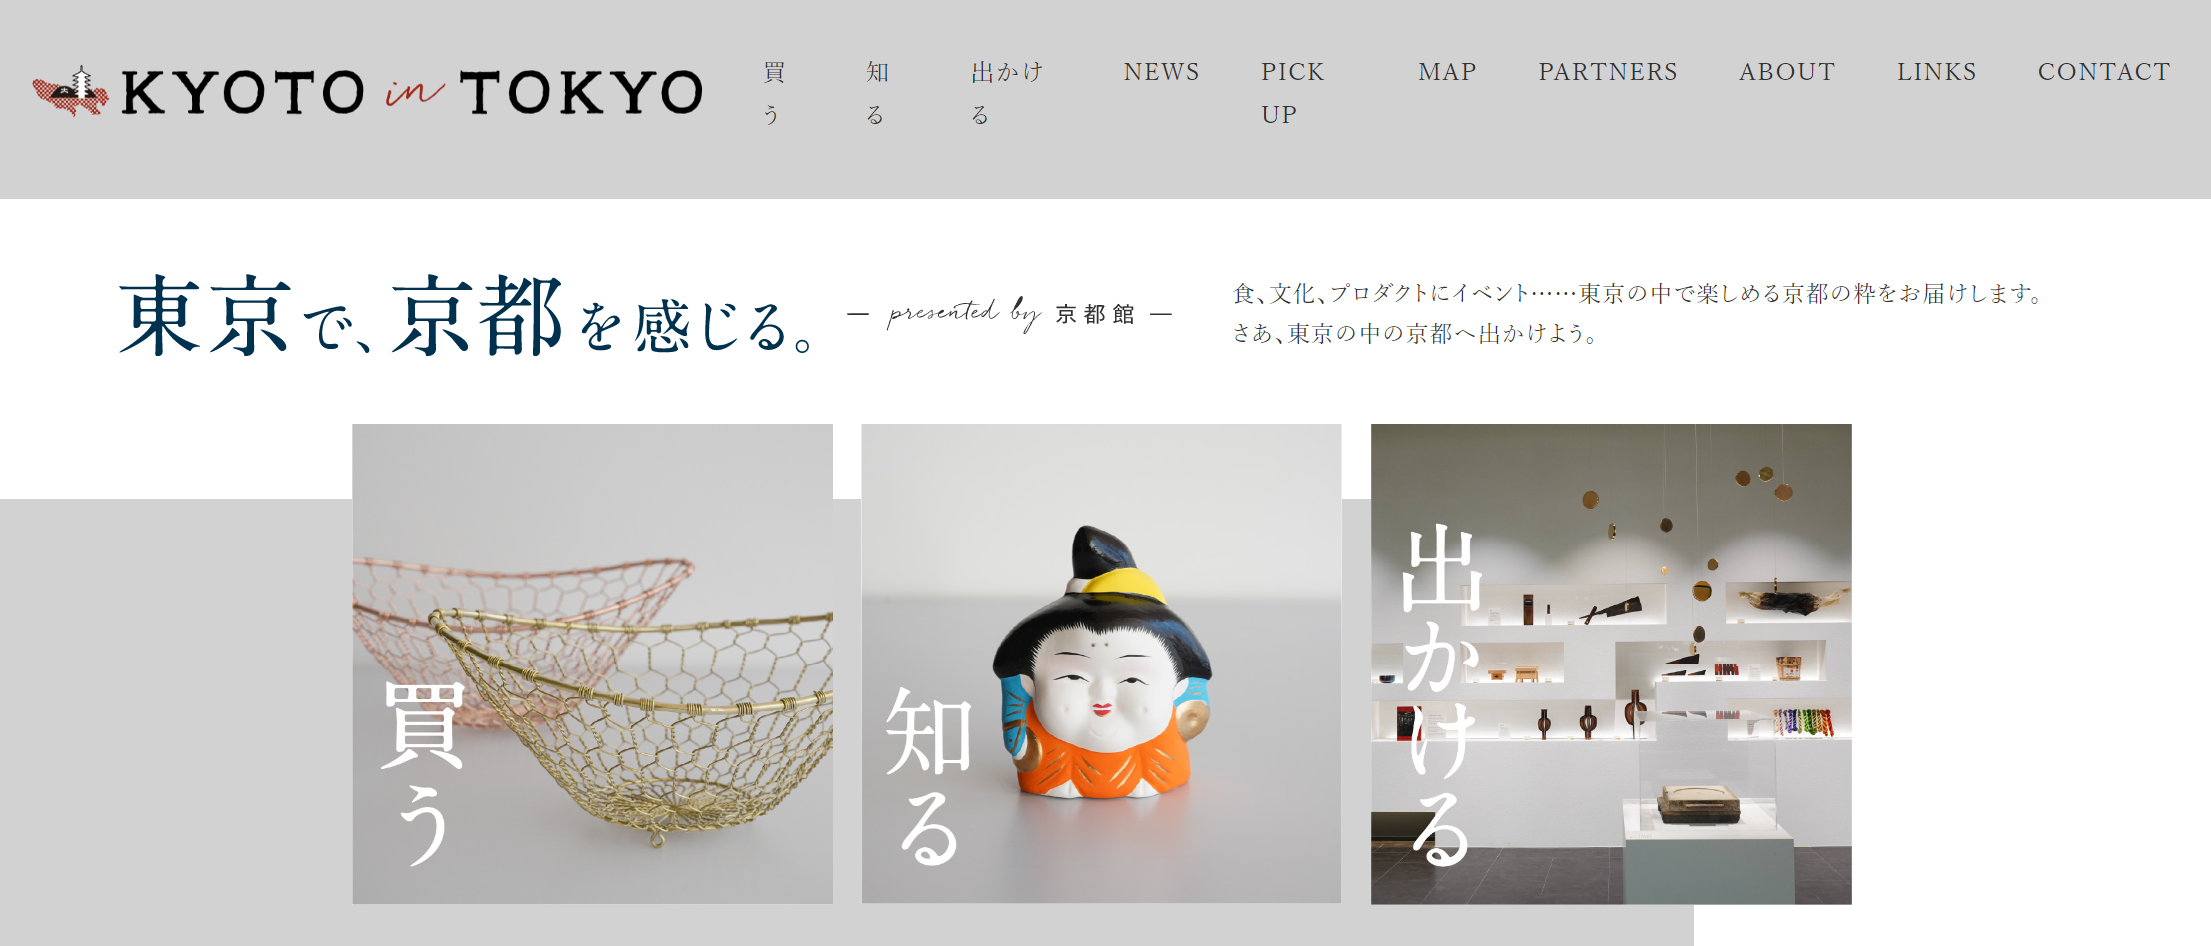 Kyoto in Tokyo ウェブサイト